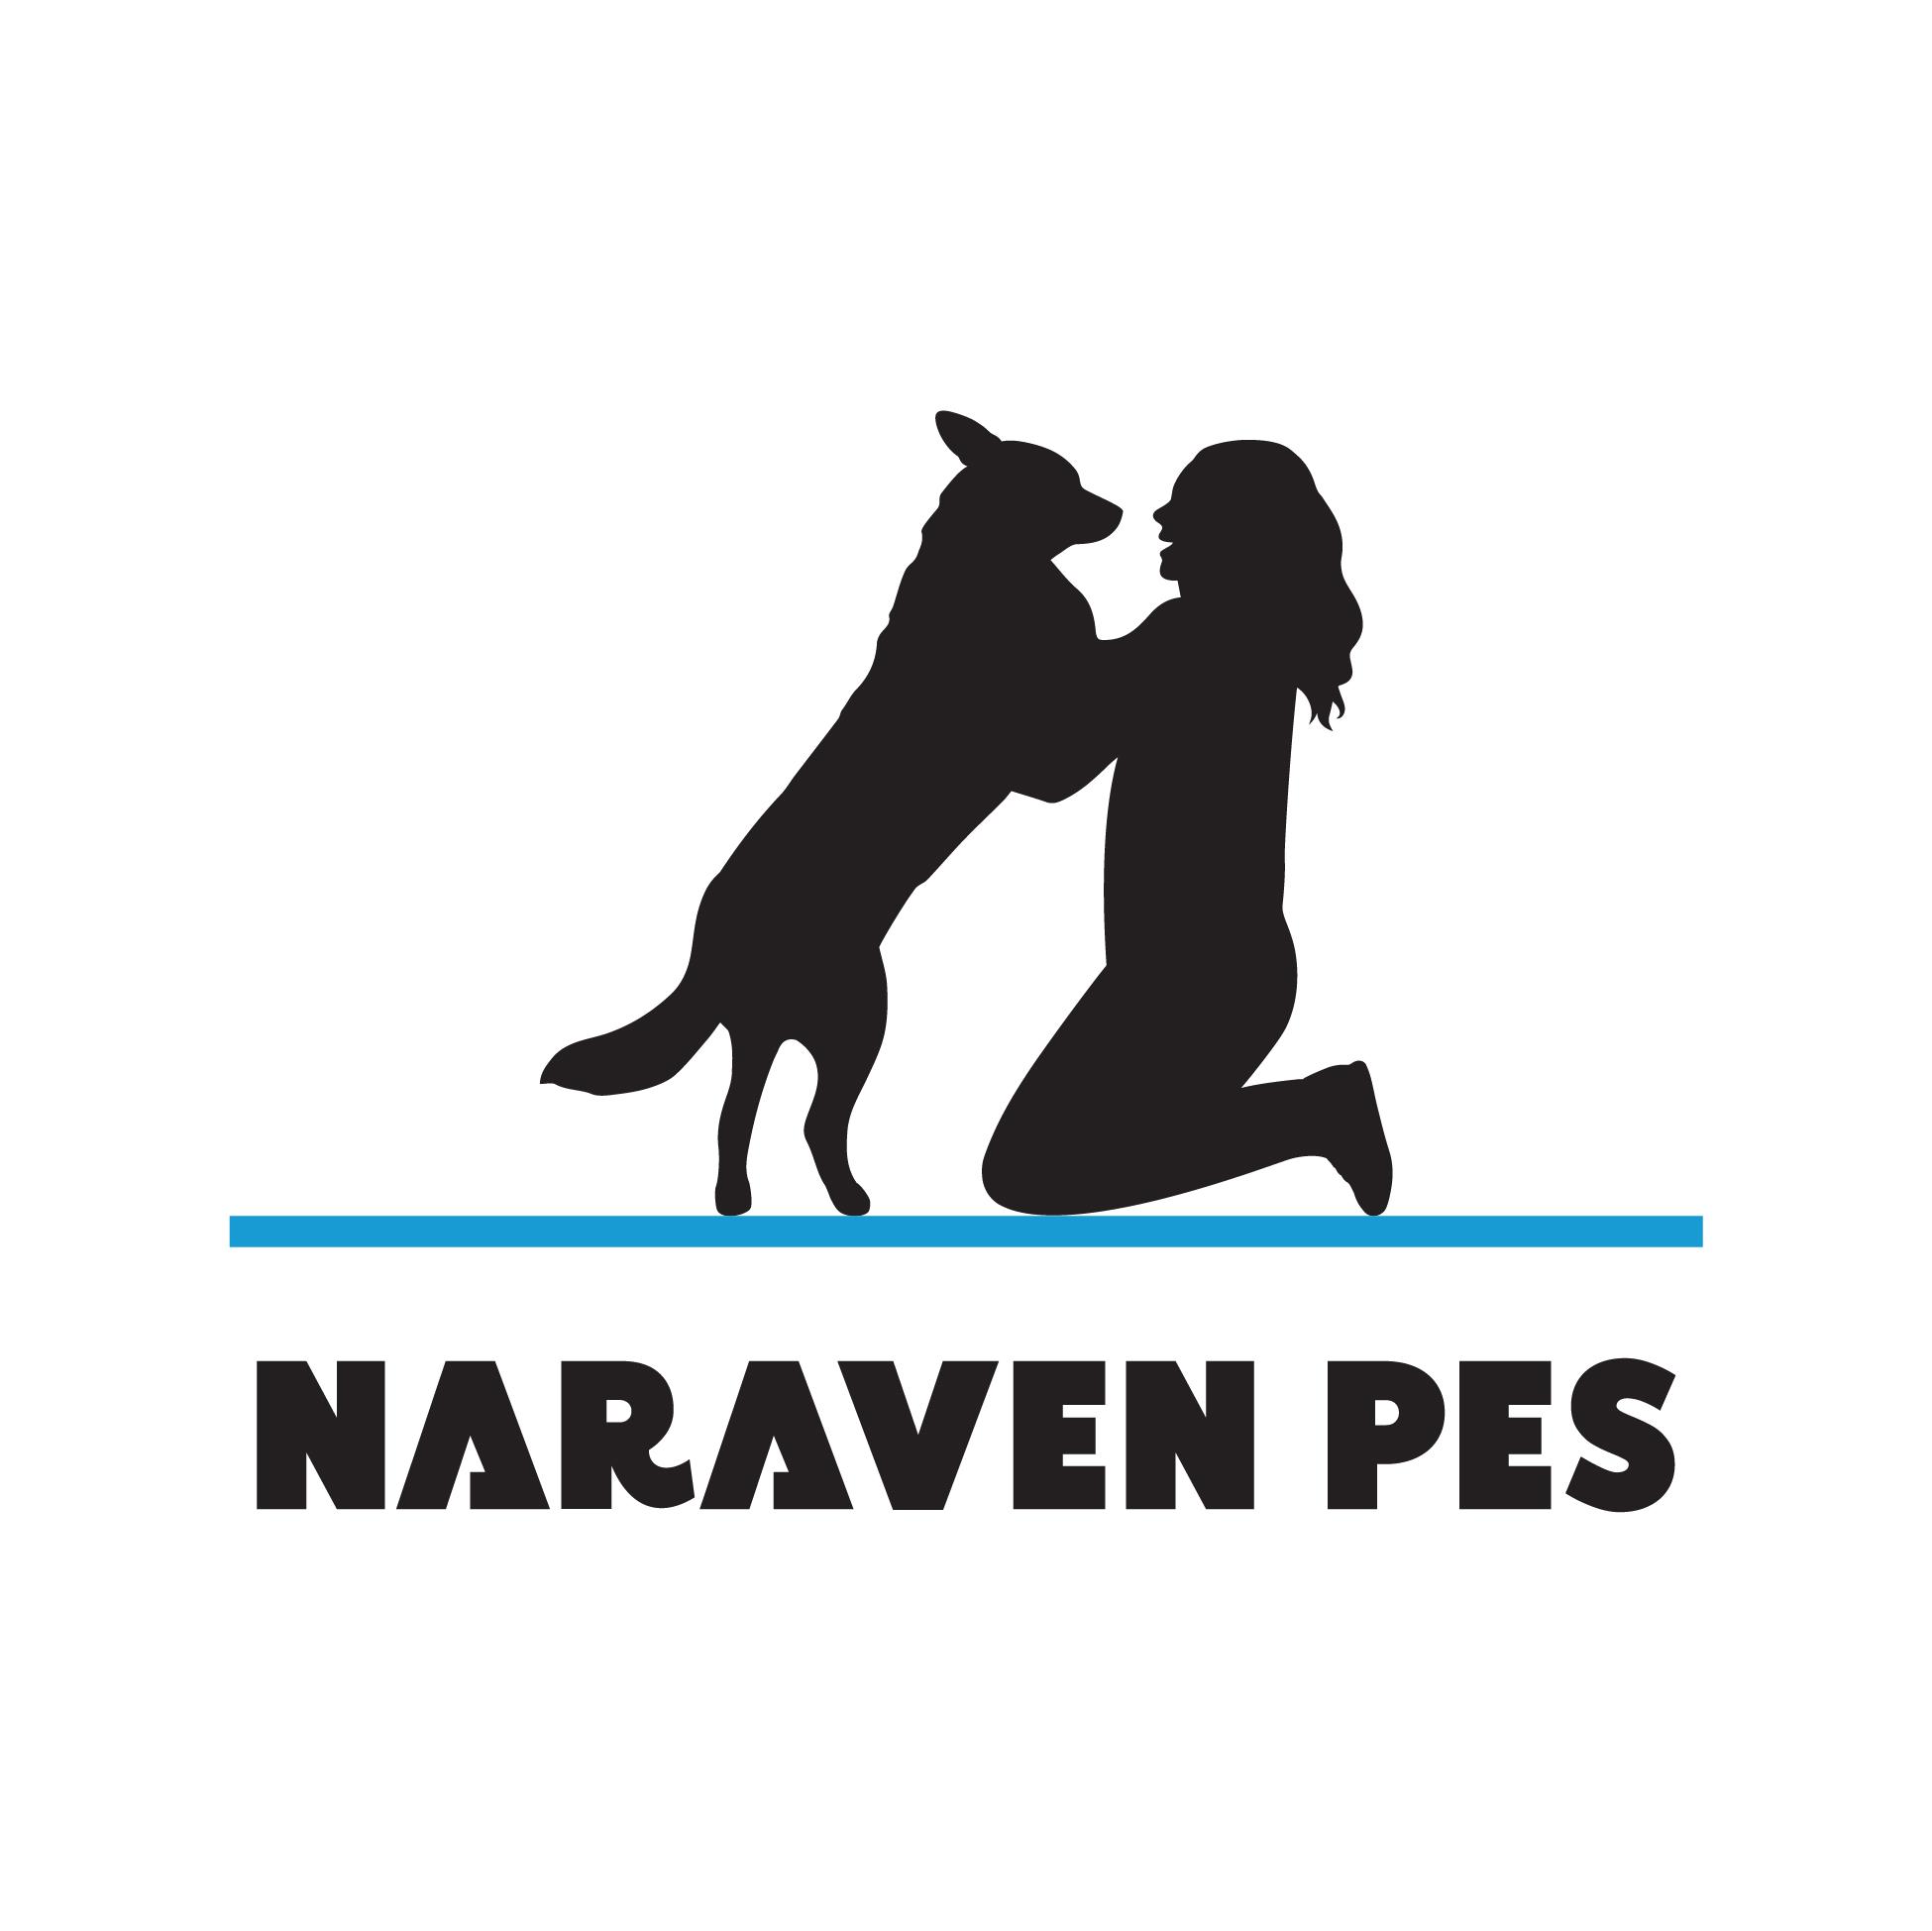 Pasja šola Naraven pes – pristop